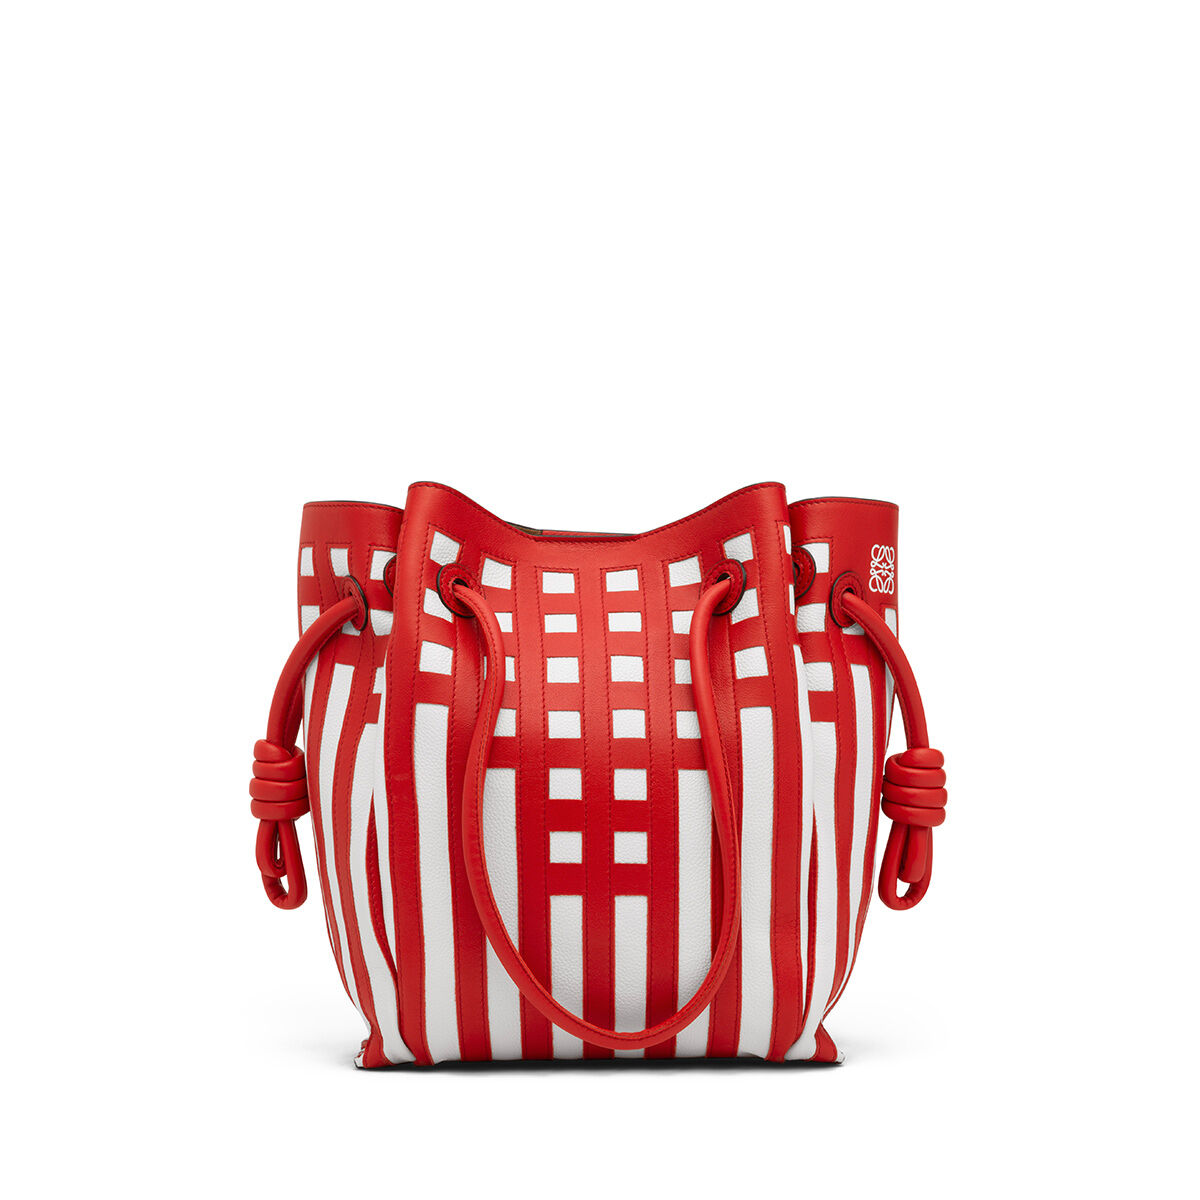 LOEWE Flamenco Knot Tote Grid S Bag Scarlet Red/White all